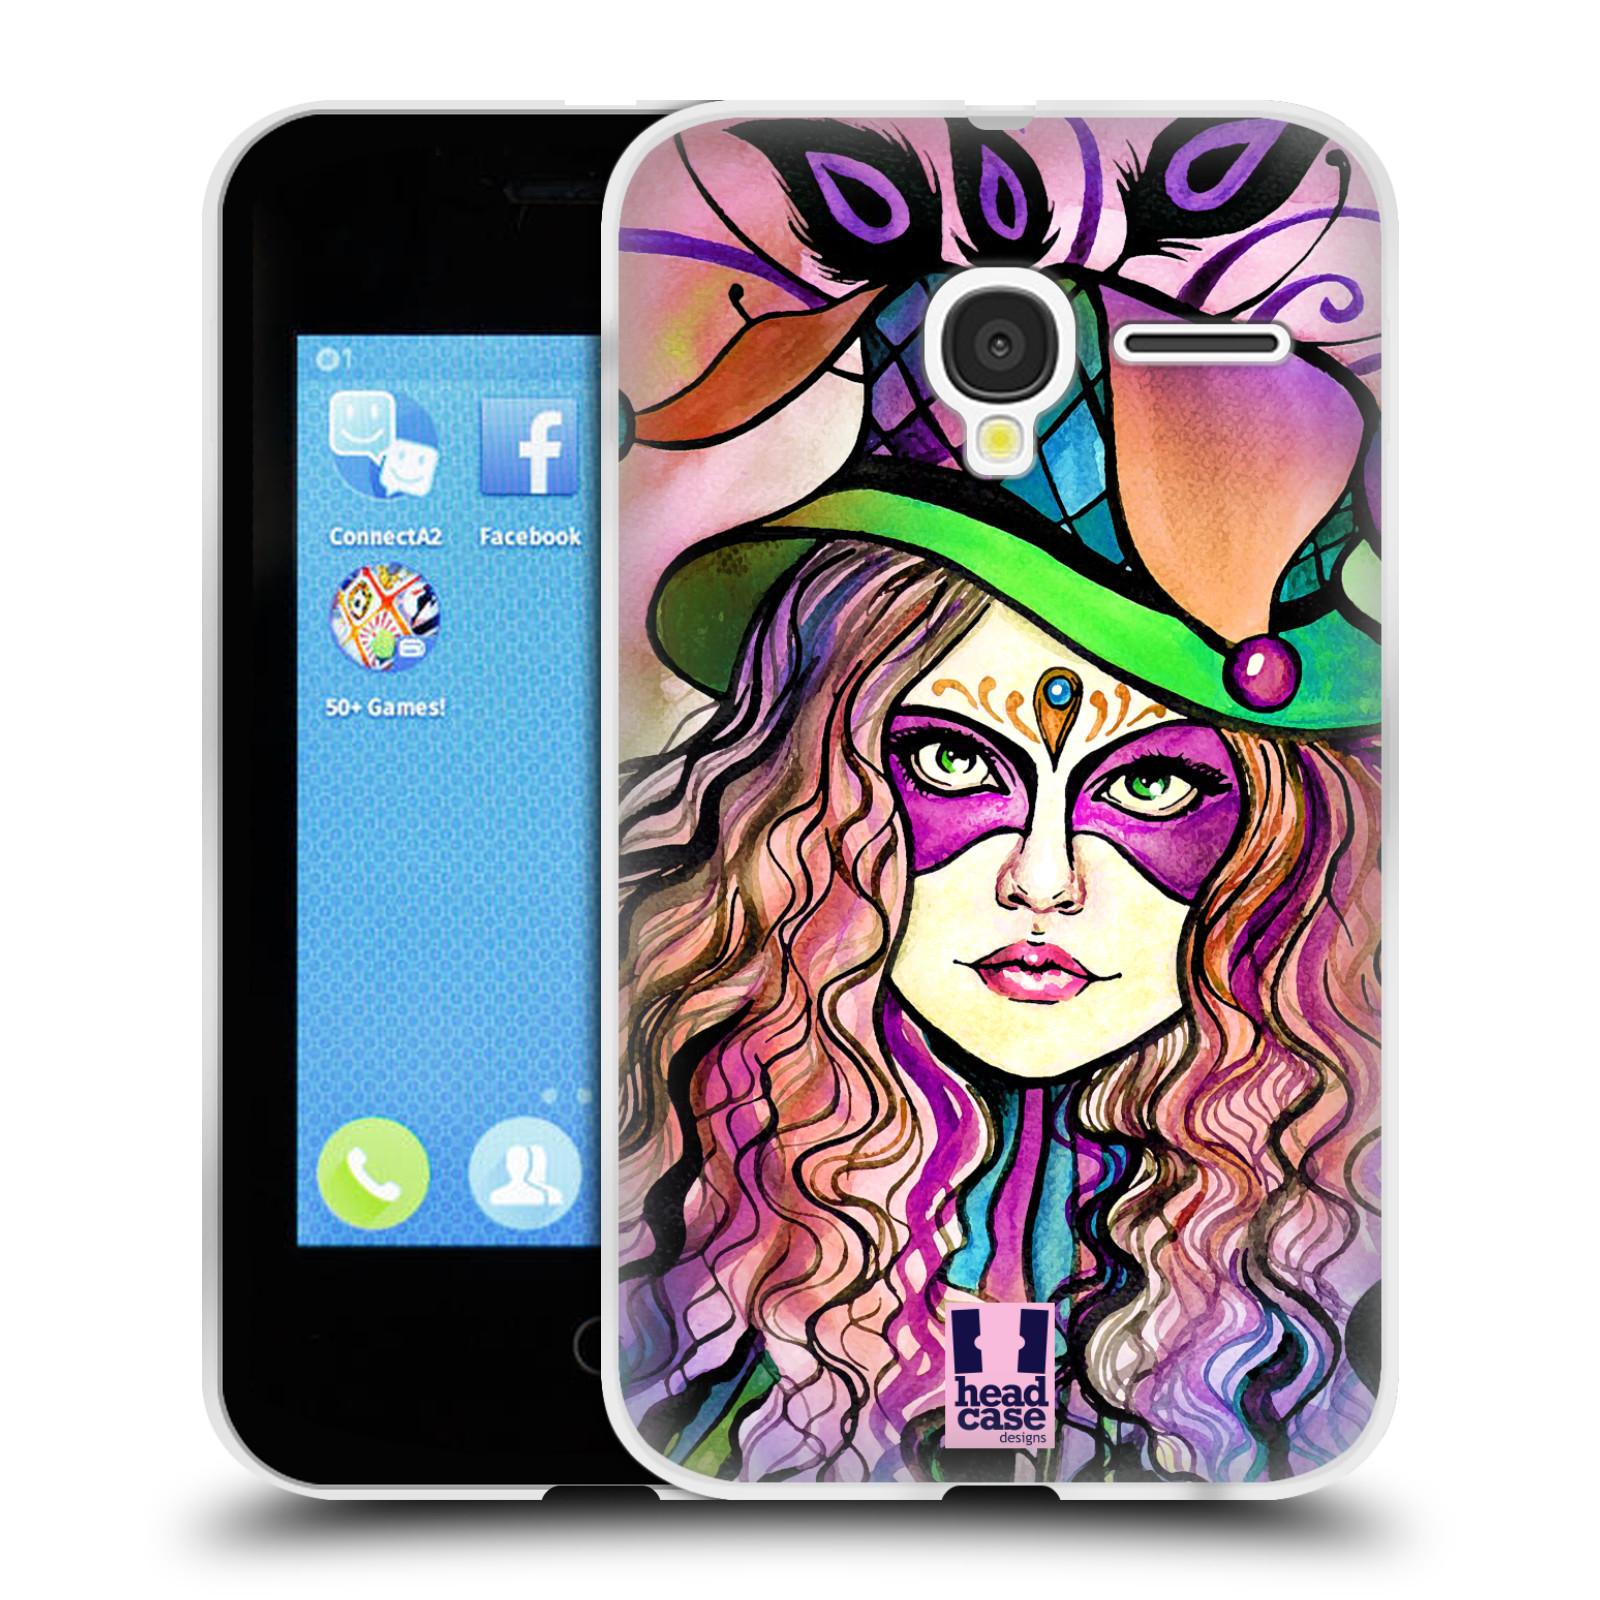 HEAD CASE silikonový obal na mobil Alcatel PIXI 3 OT-4022D (3,5 palcový displej) vzor Maškarní ples masky kreslené vzory KLOBOUK